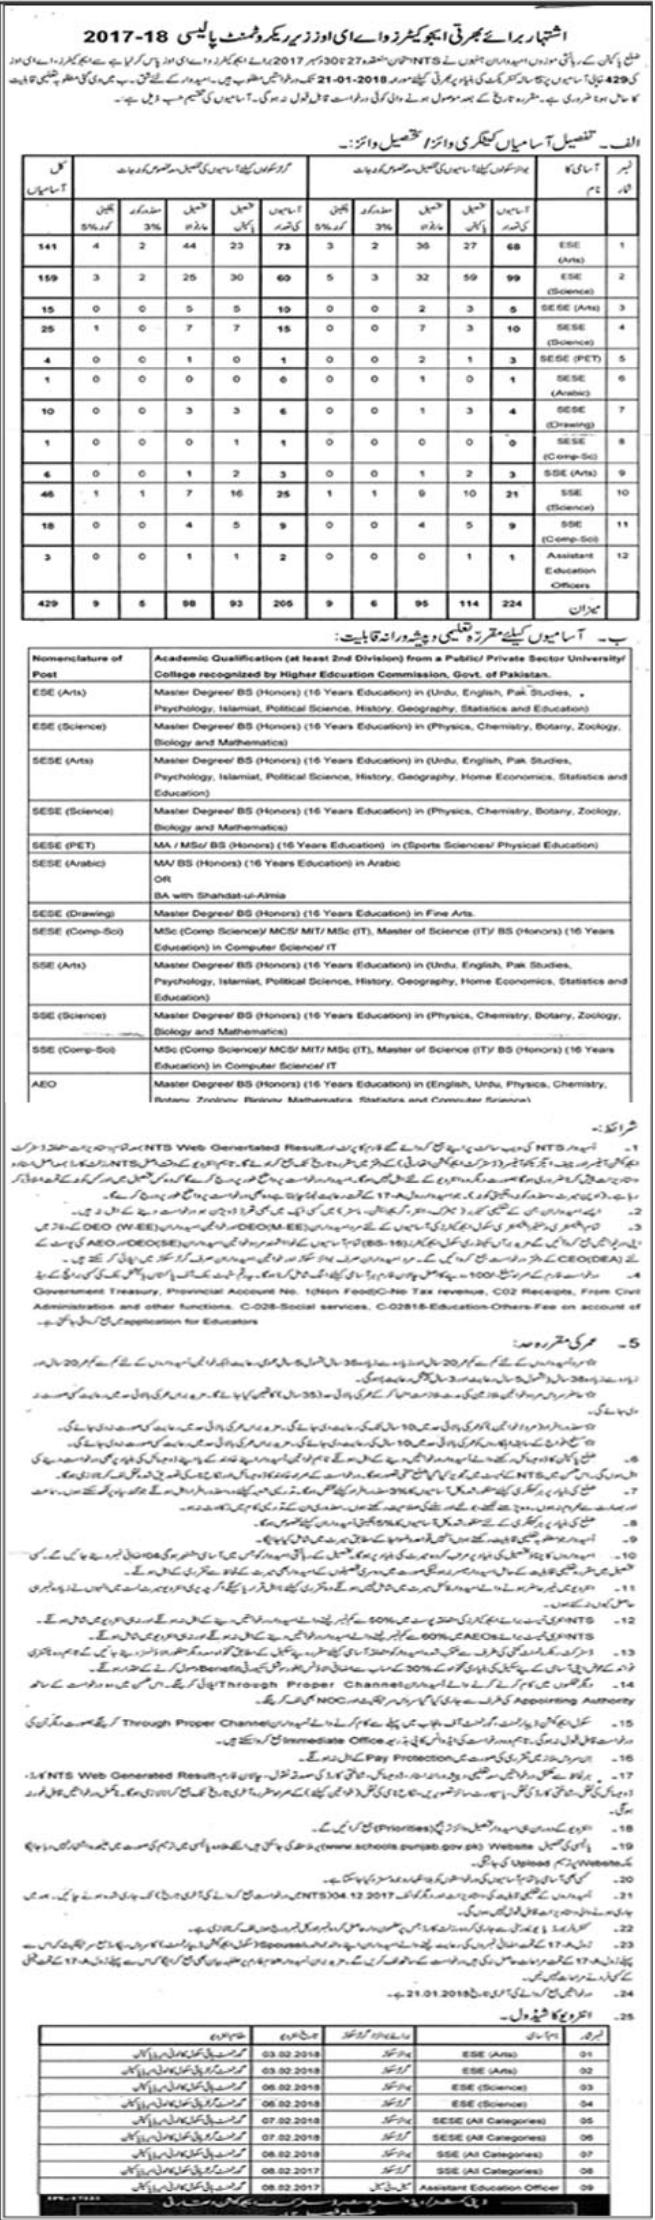 Teacher & Assistant Education Officer Jobs in Pakpattan